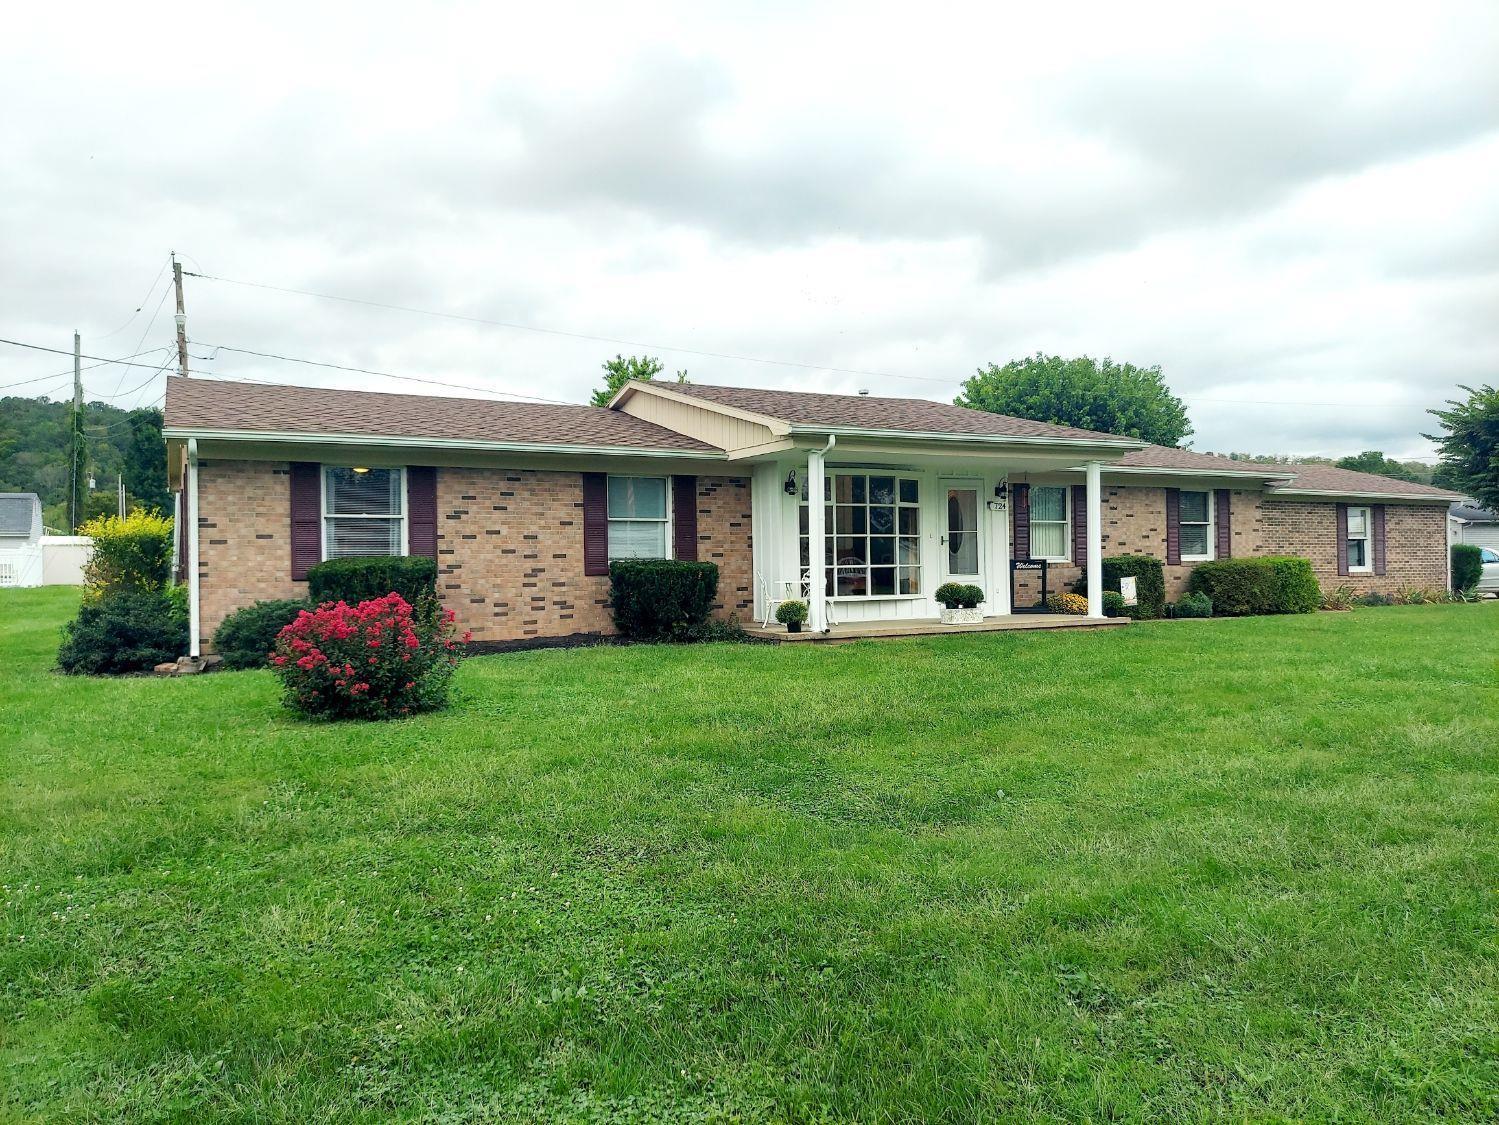 724 Linda Vista Dr Property Photo